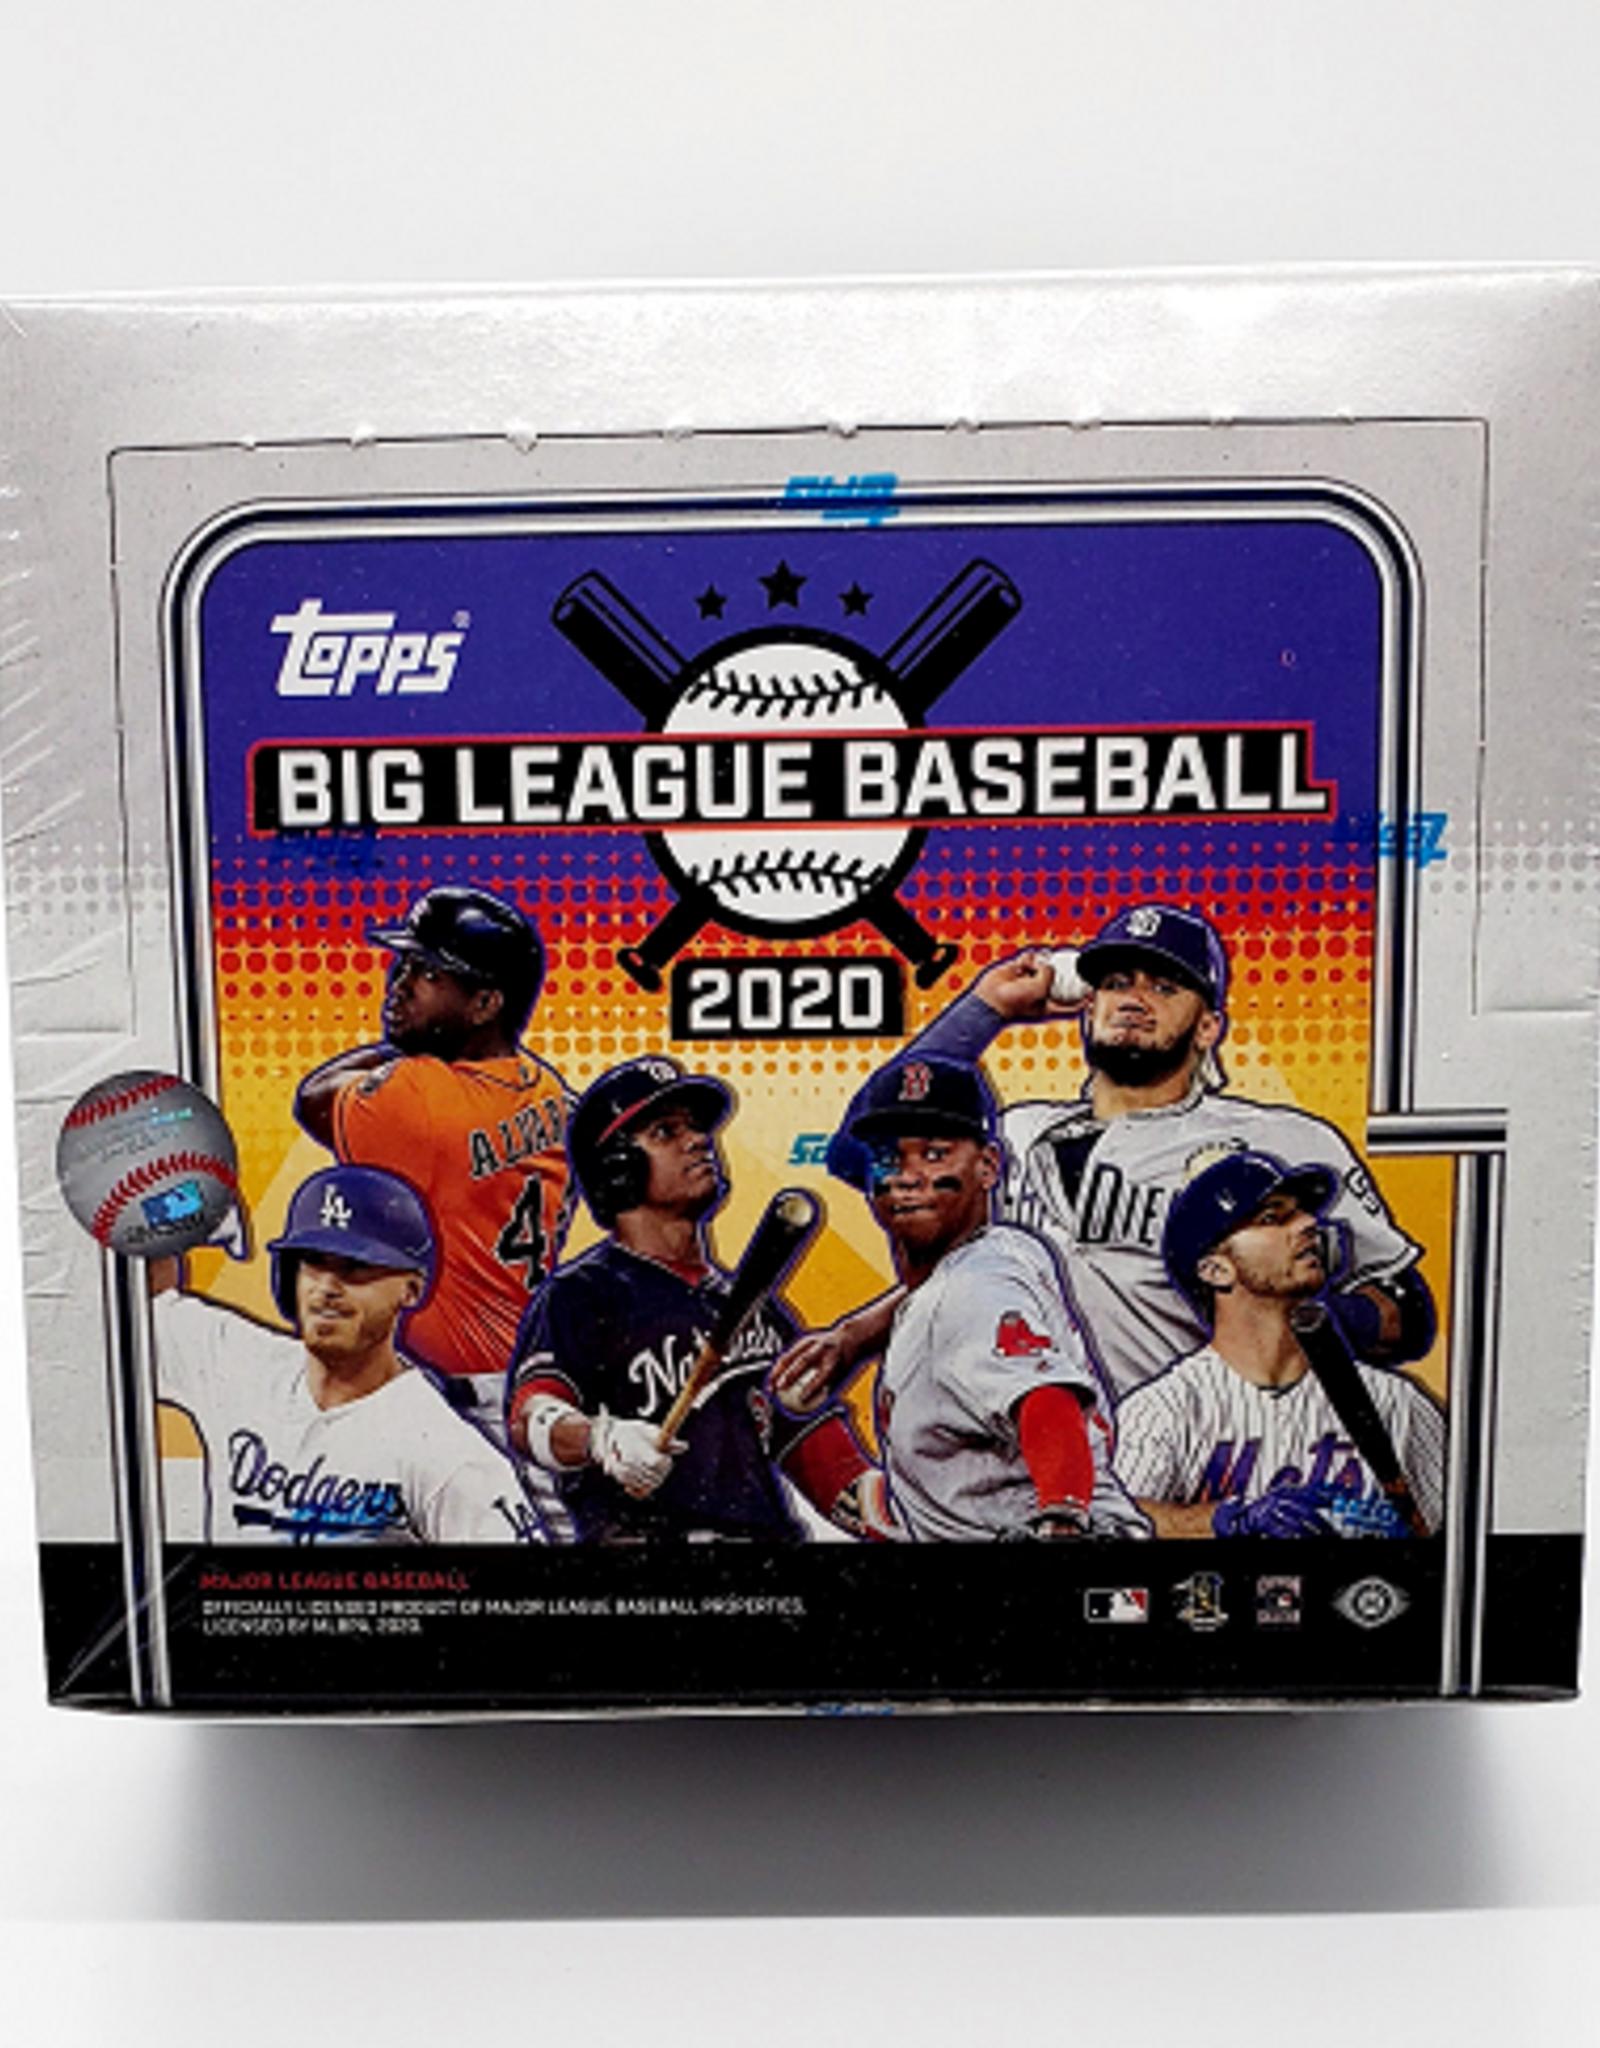 Topps 2020 Topps Big League Baseball Hobby Box